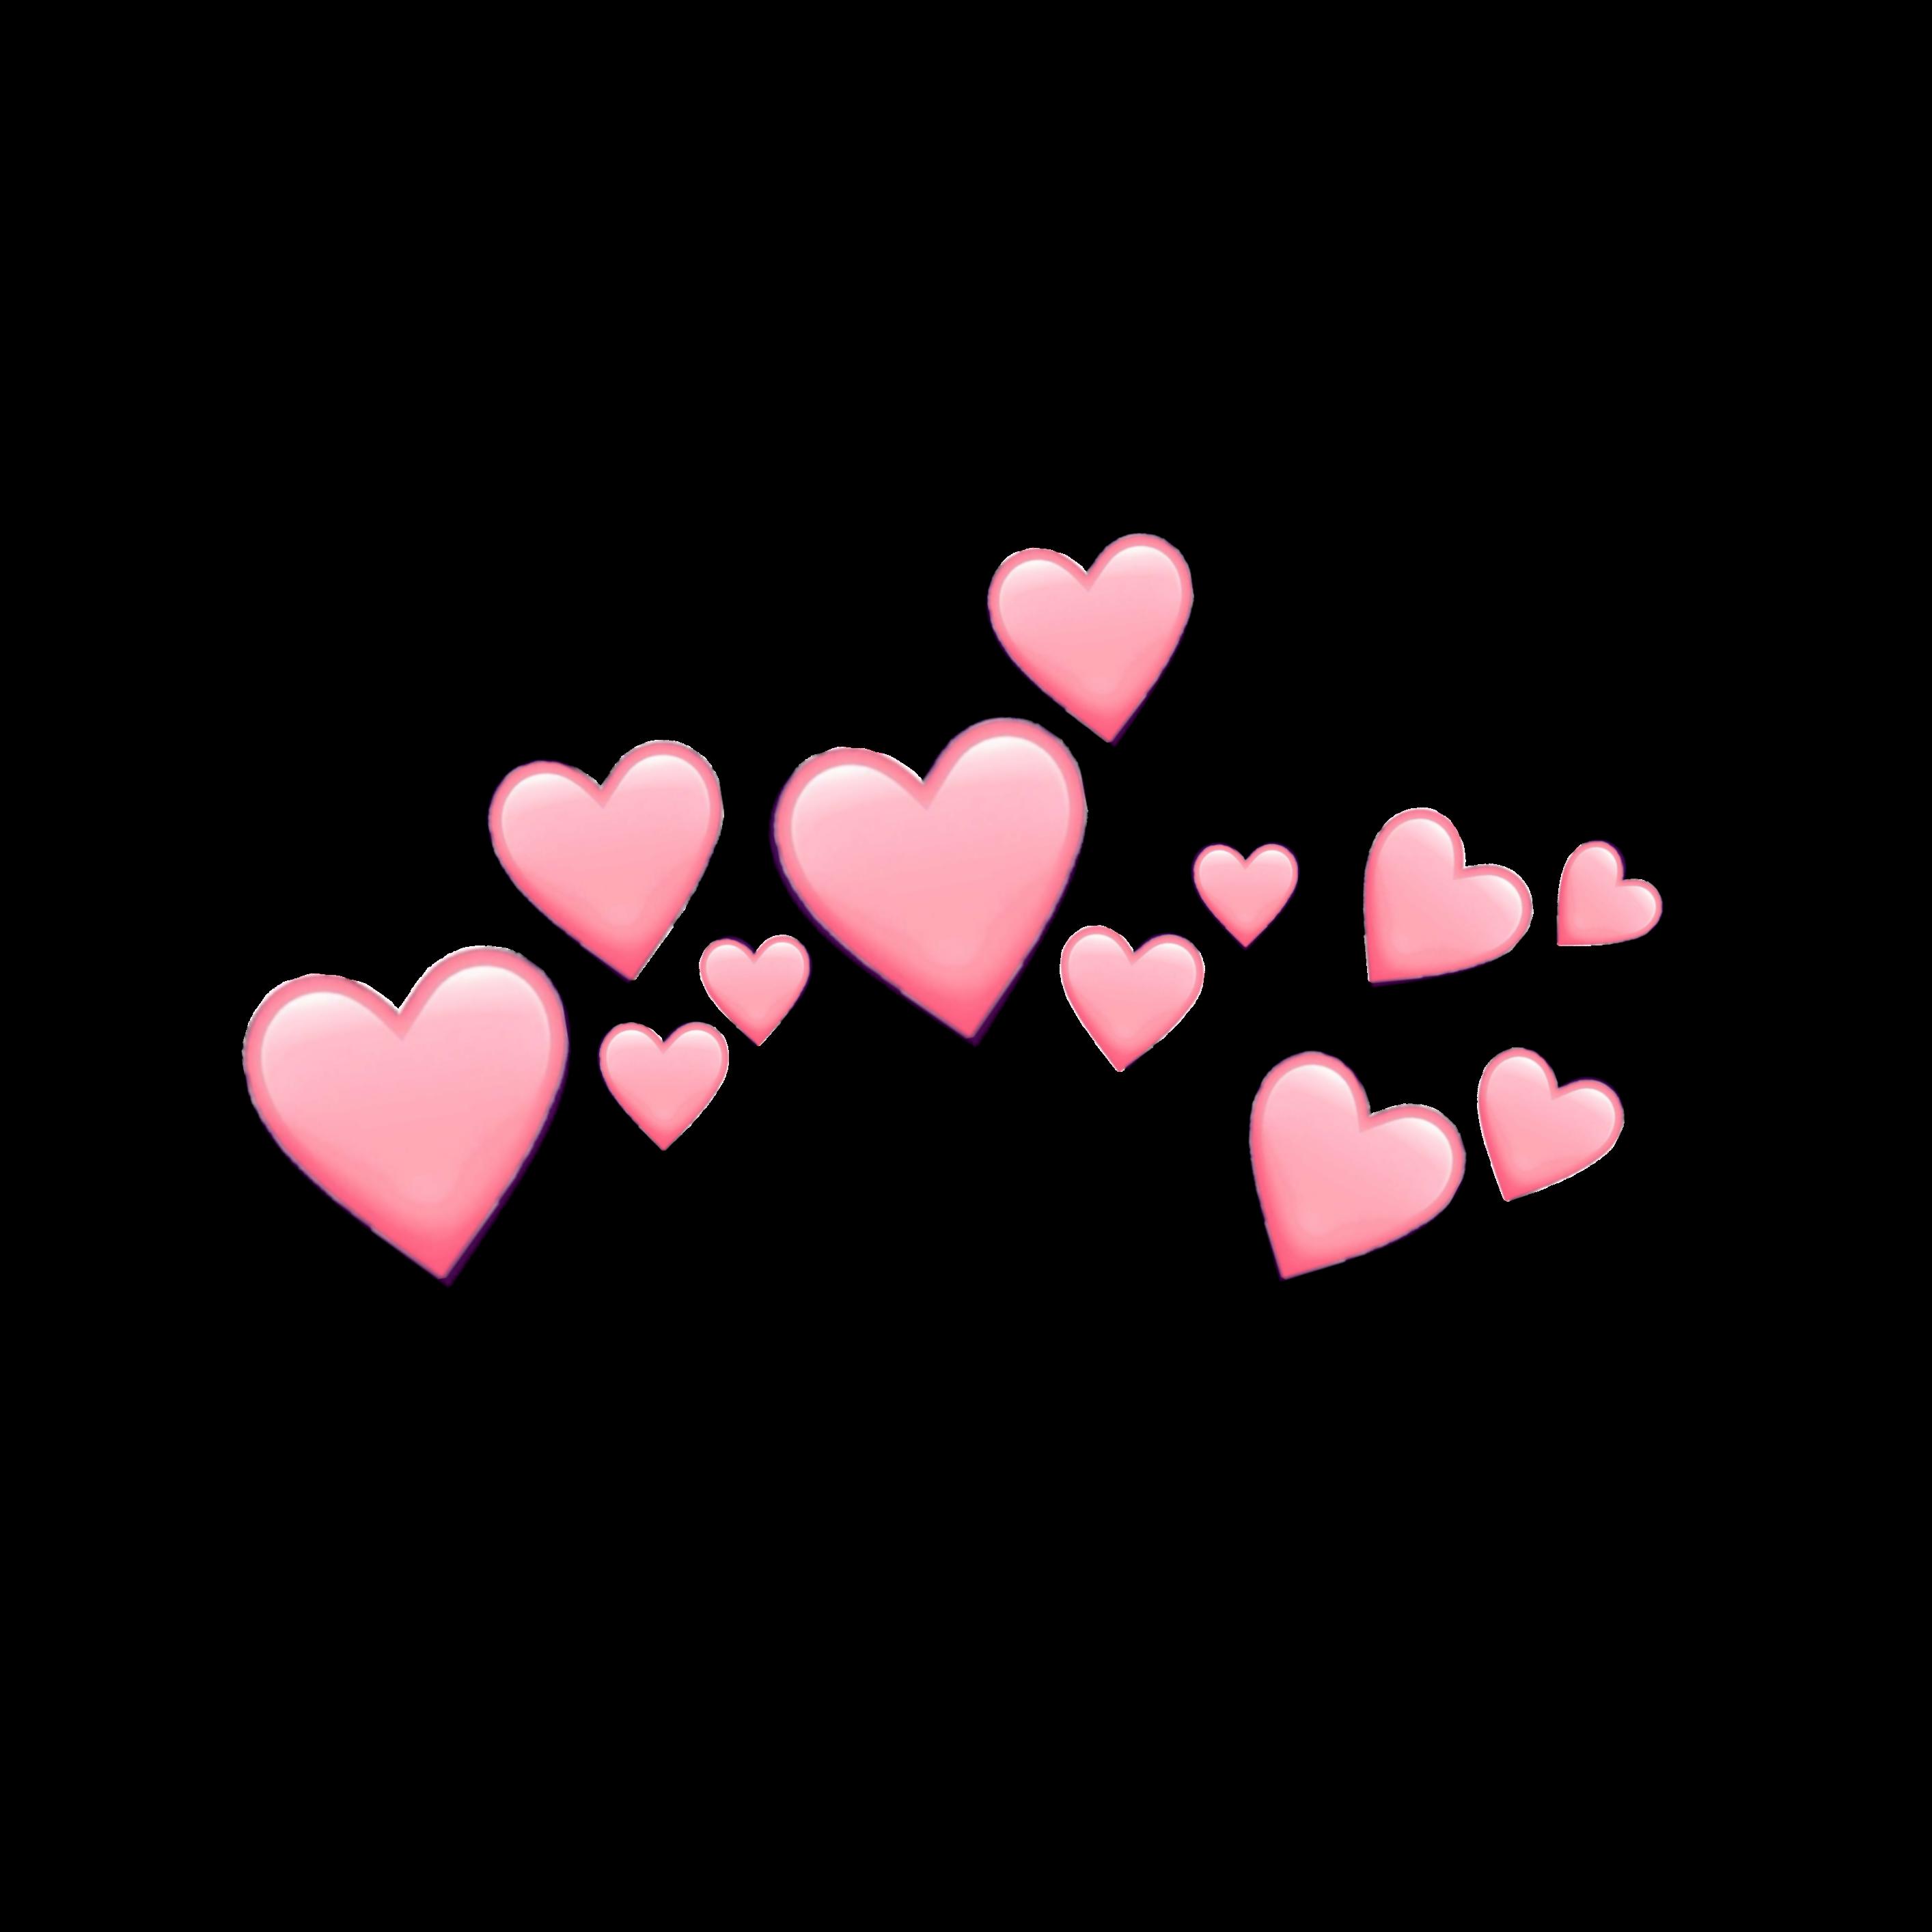 pink hearts emoji pinkemoji heart heartemoji crown cute...